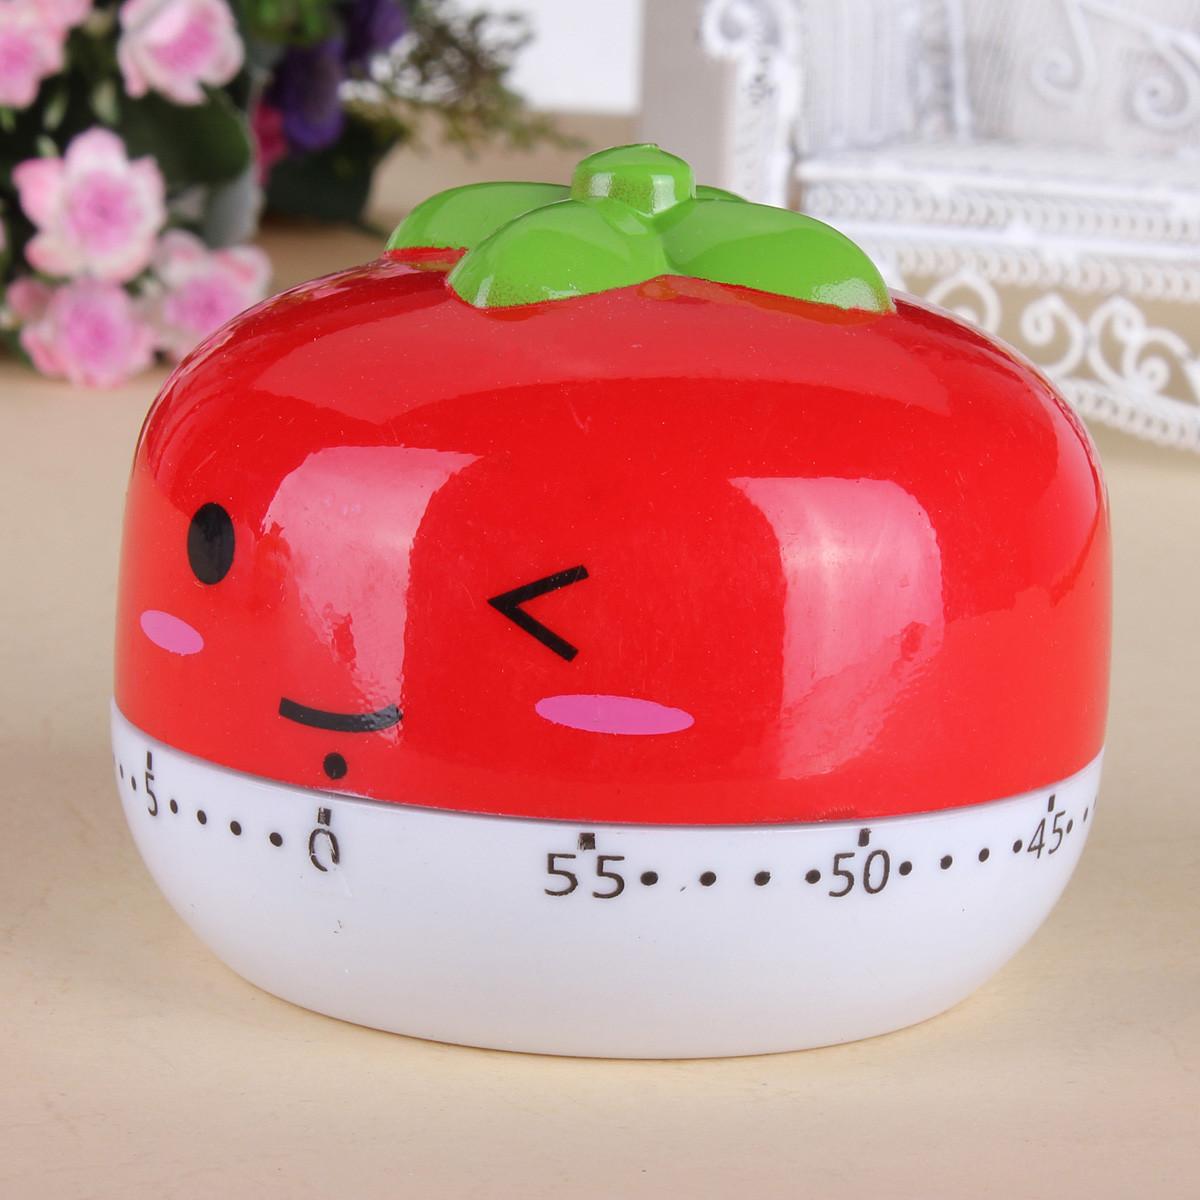 Sweet Cartoon Animal style Kitchen Cooking  Timer 60 Minutes Bake Clock Alarm